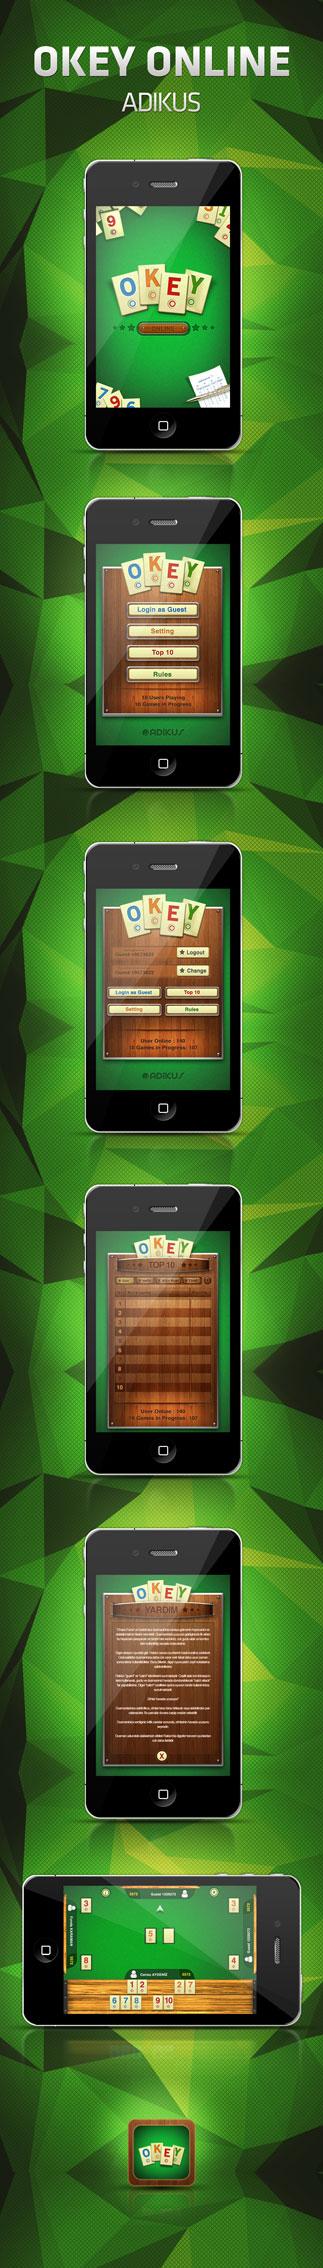 Okey Online- iPhone by operadevil69